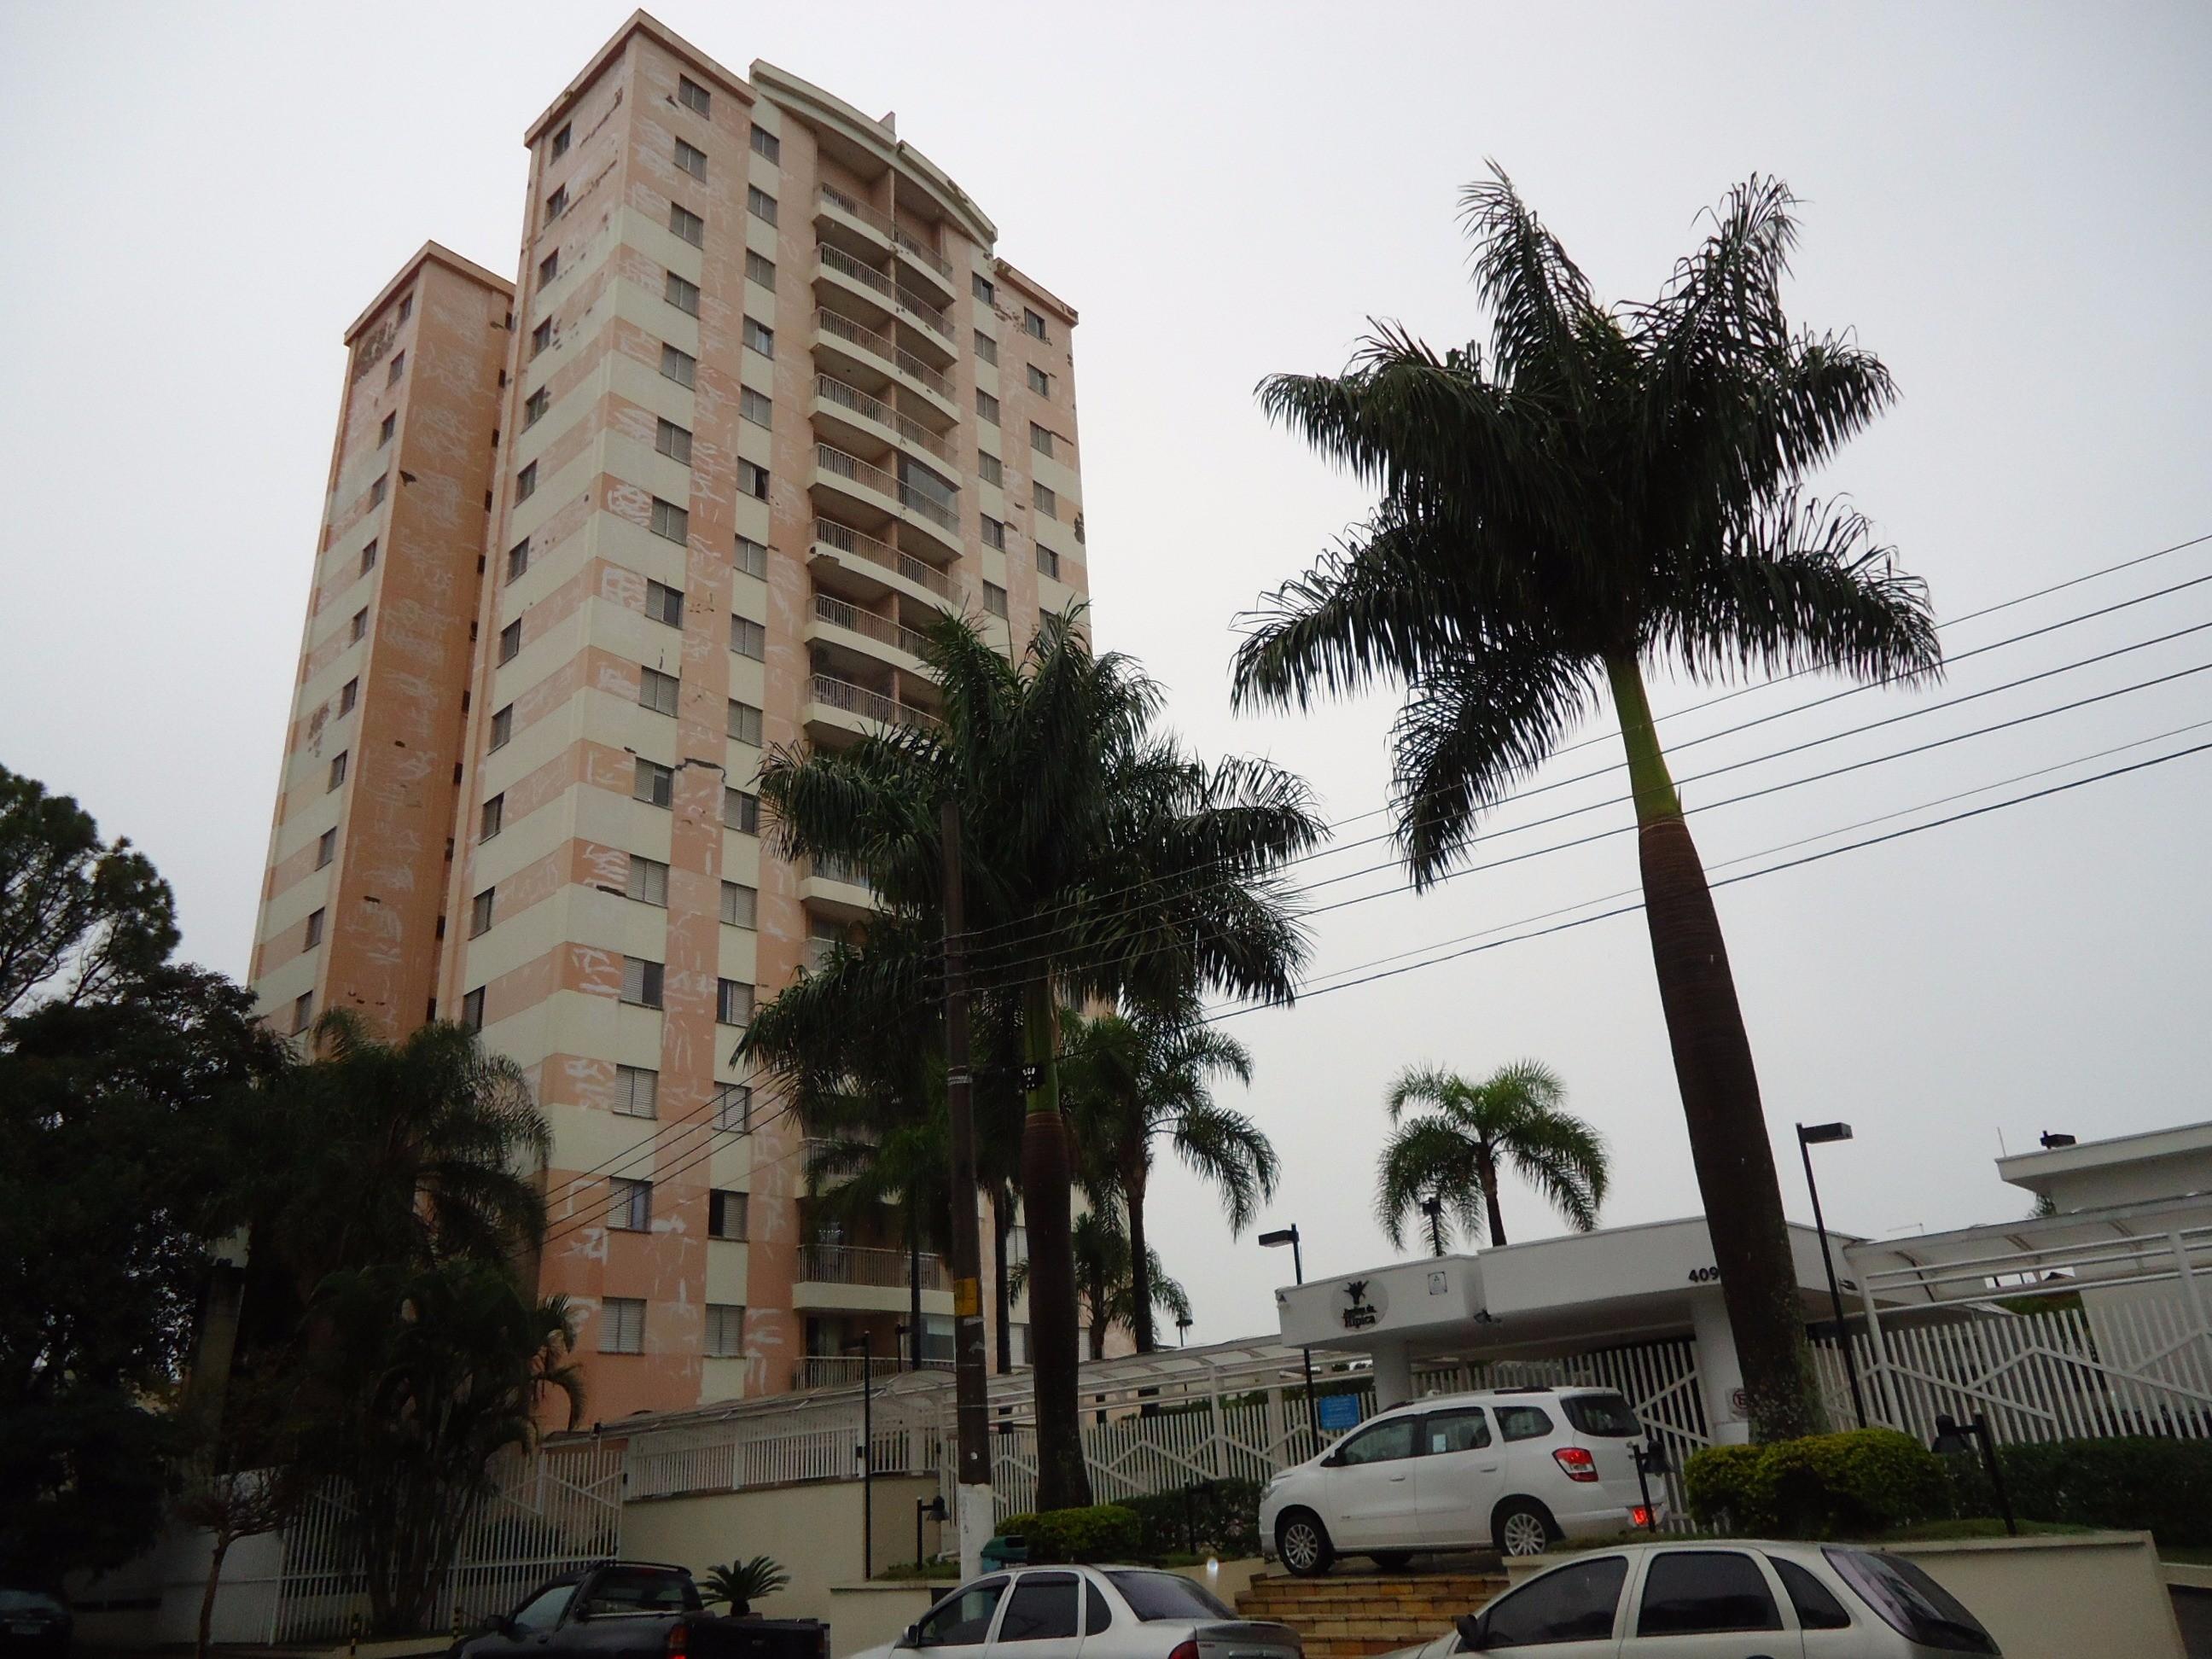 comprar ou alugar apartamento no bairro vila cruzeiro na cidade de sao paulo-sp